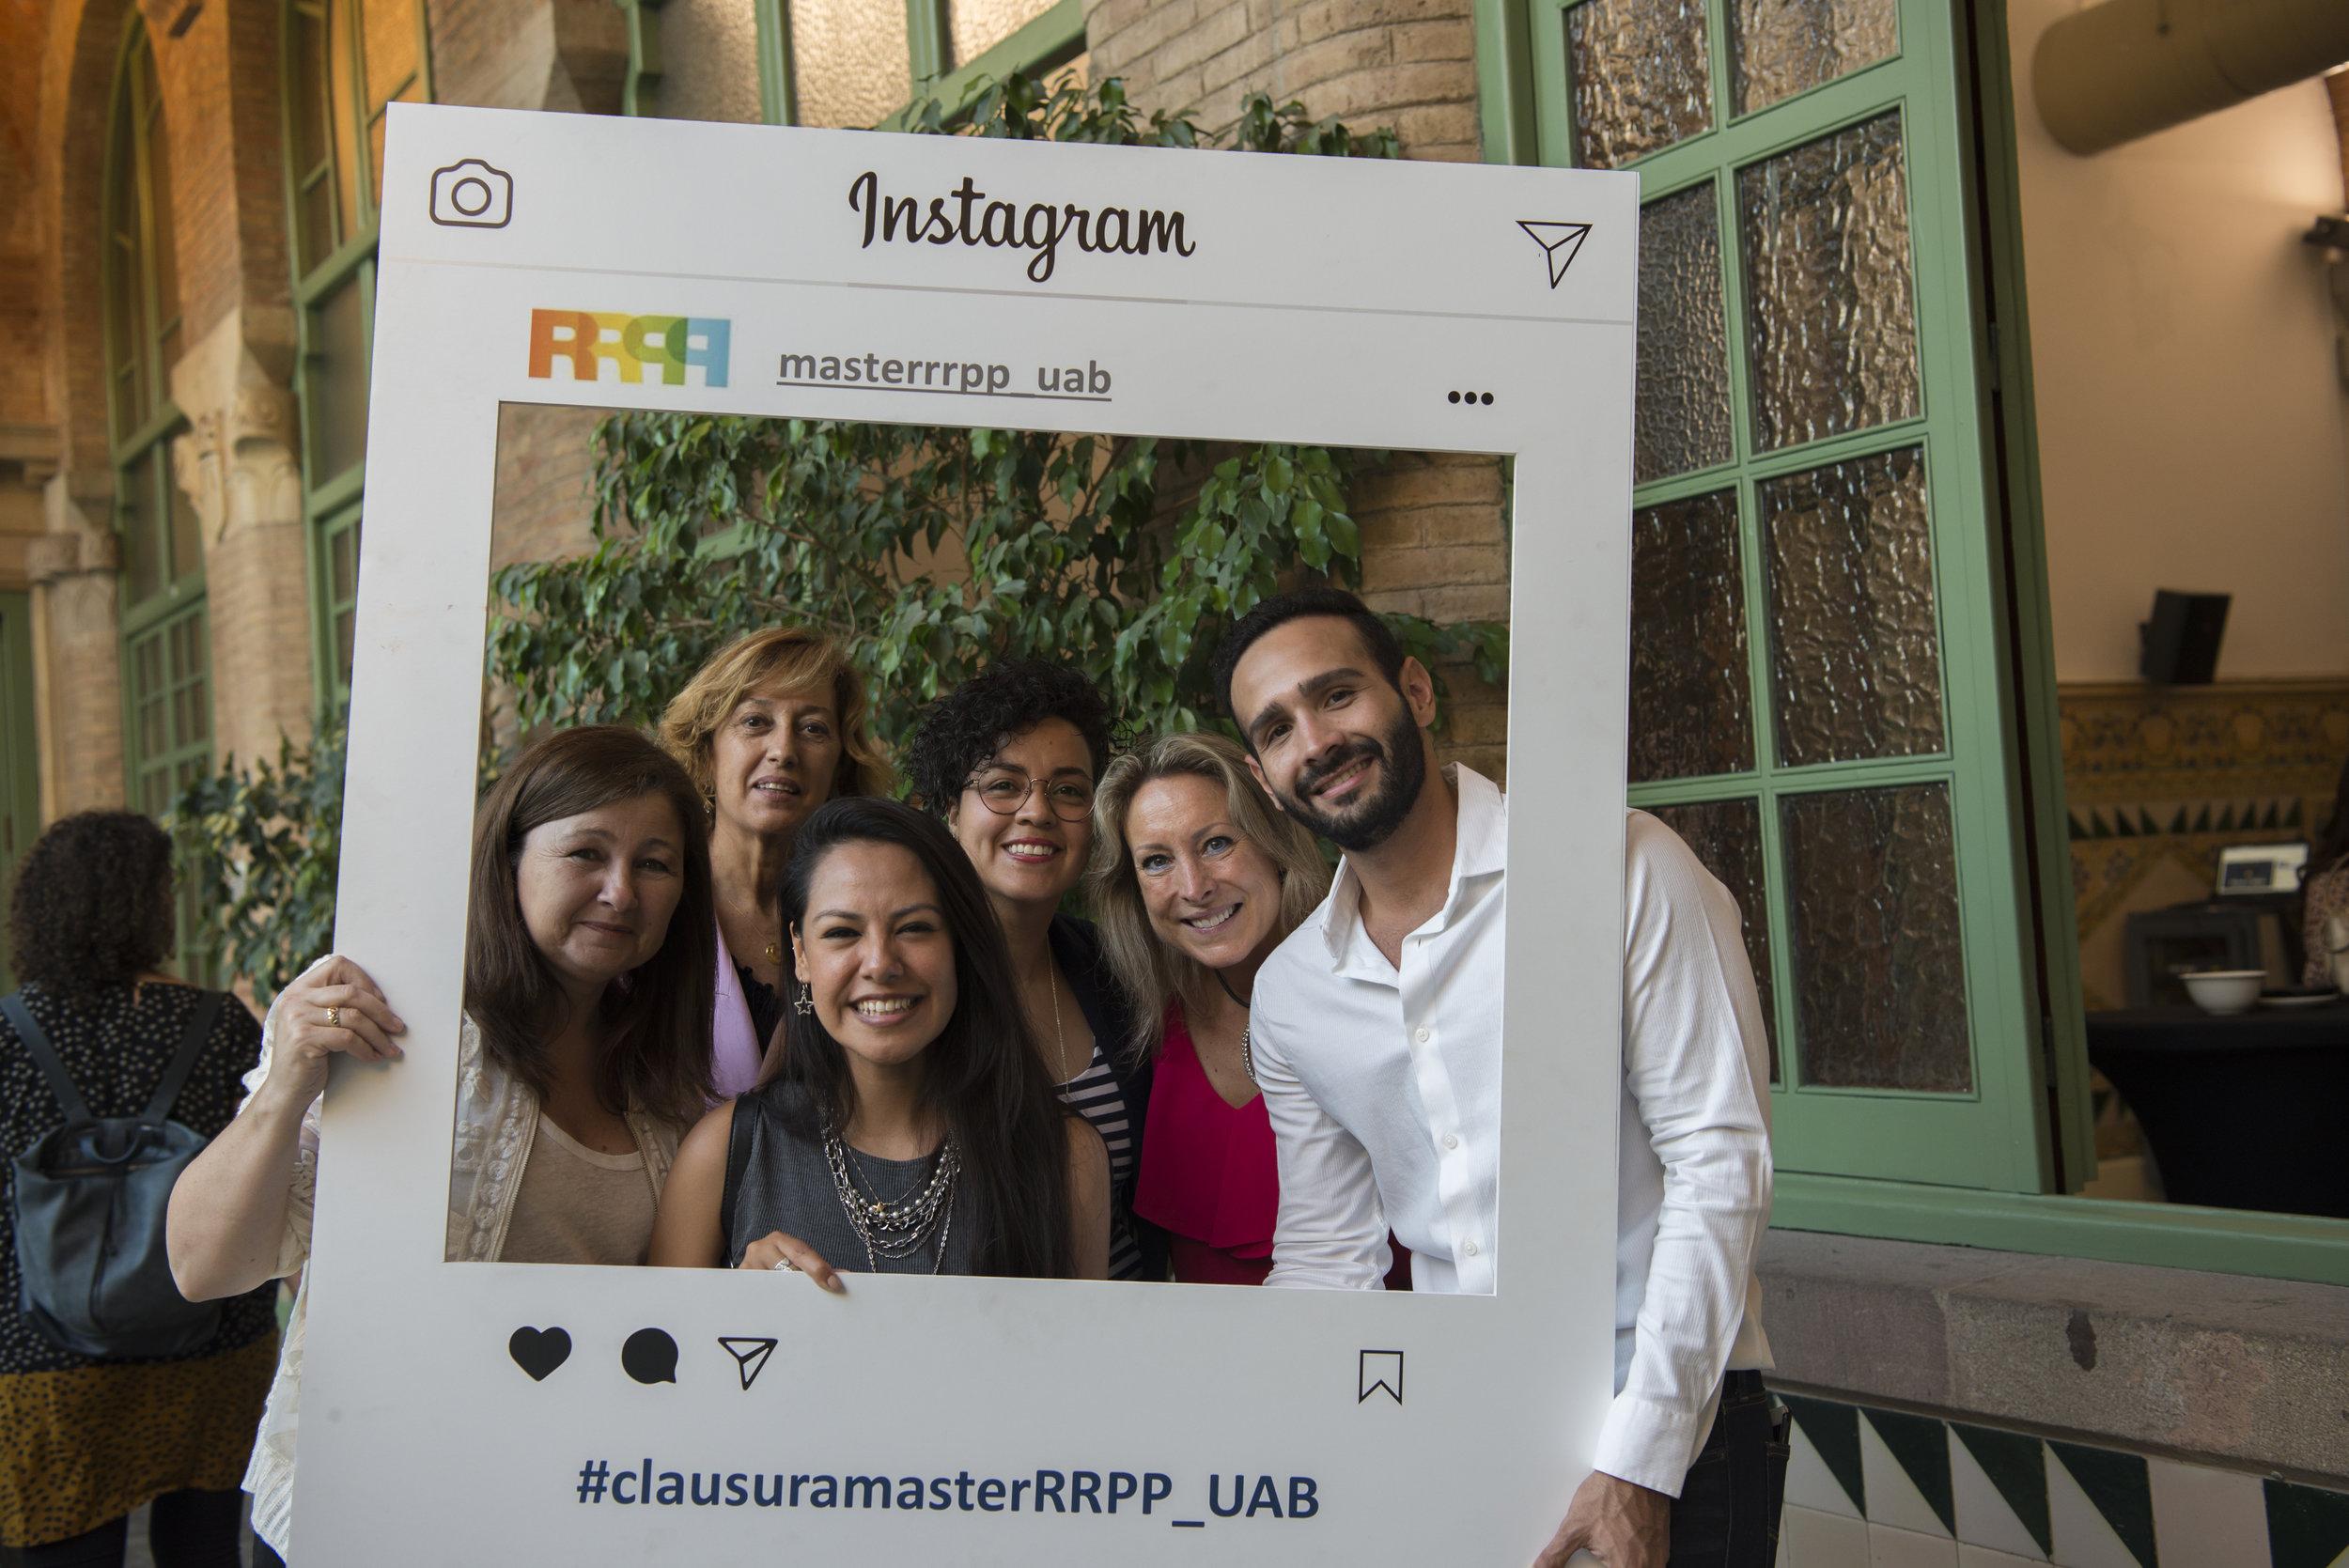 Left to right: Maite Llopis - CEO de 1990 MCS; Ana Ullod - Dra. Master RRPP; Lorena Sanchez (classmate), Viviana Moran (me), Ivonne Dalmases - Masters Coordinator and José Sosa (classmate)